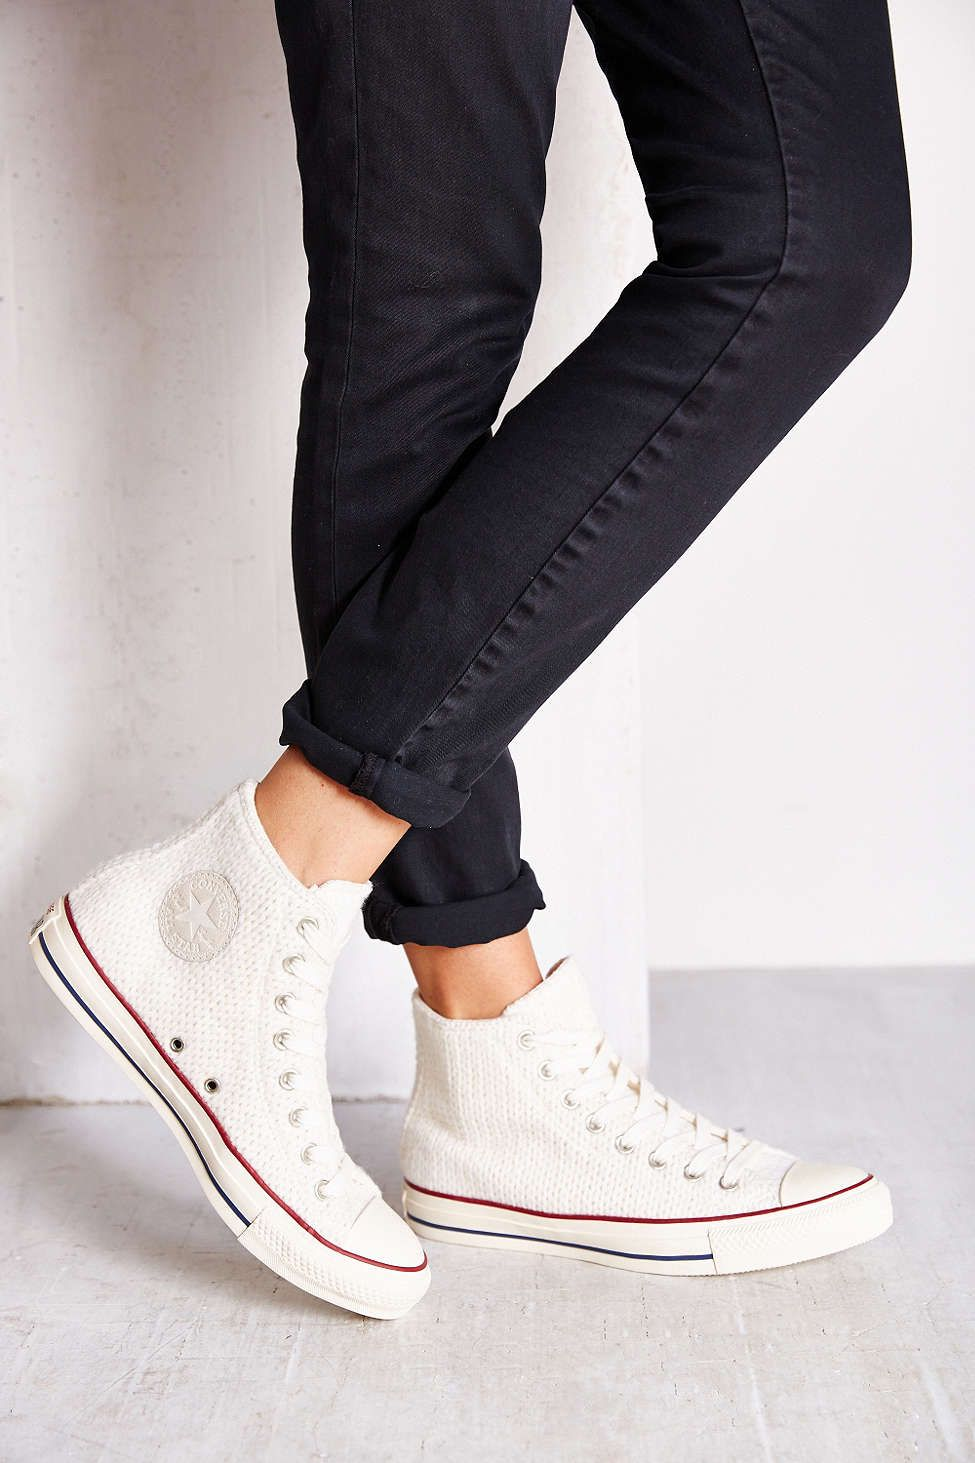 204d810c1d13 Converse Winter Knit High-Top Womens Sneaker - Urban Outfitters ...